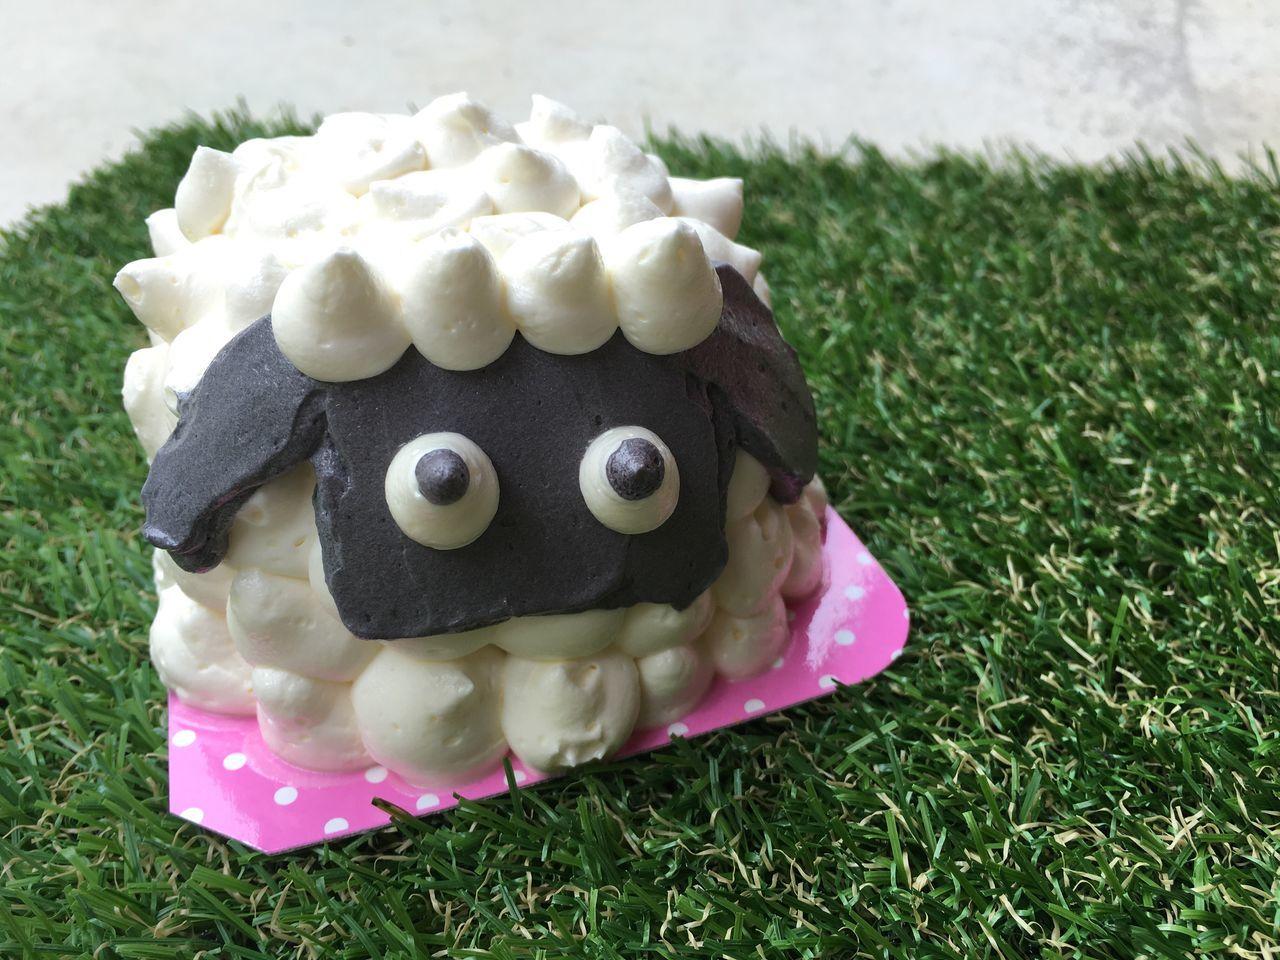 Sheep Cake Cake Birthday Grass Morning Free Time Coffee Break